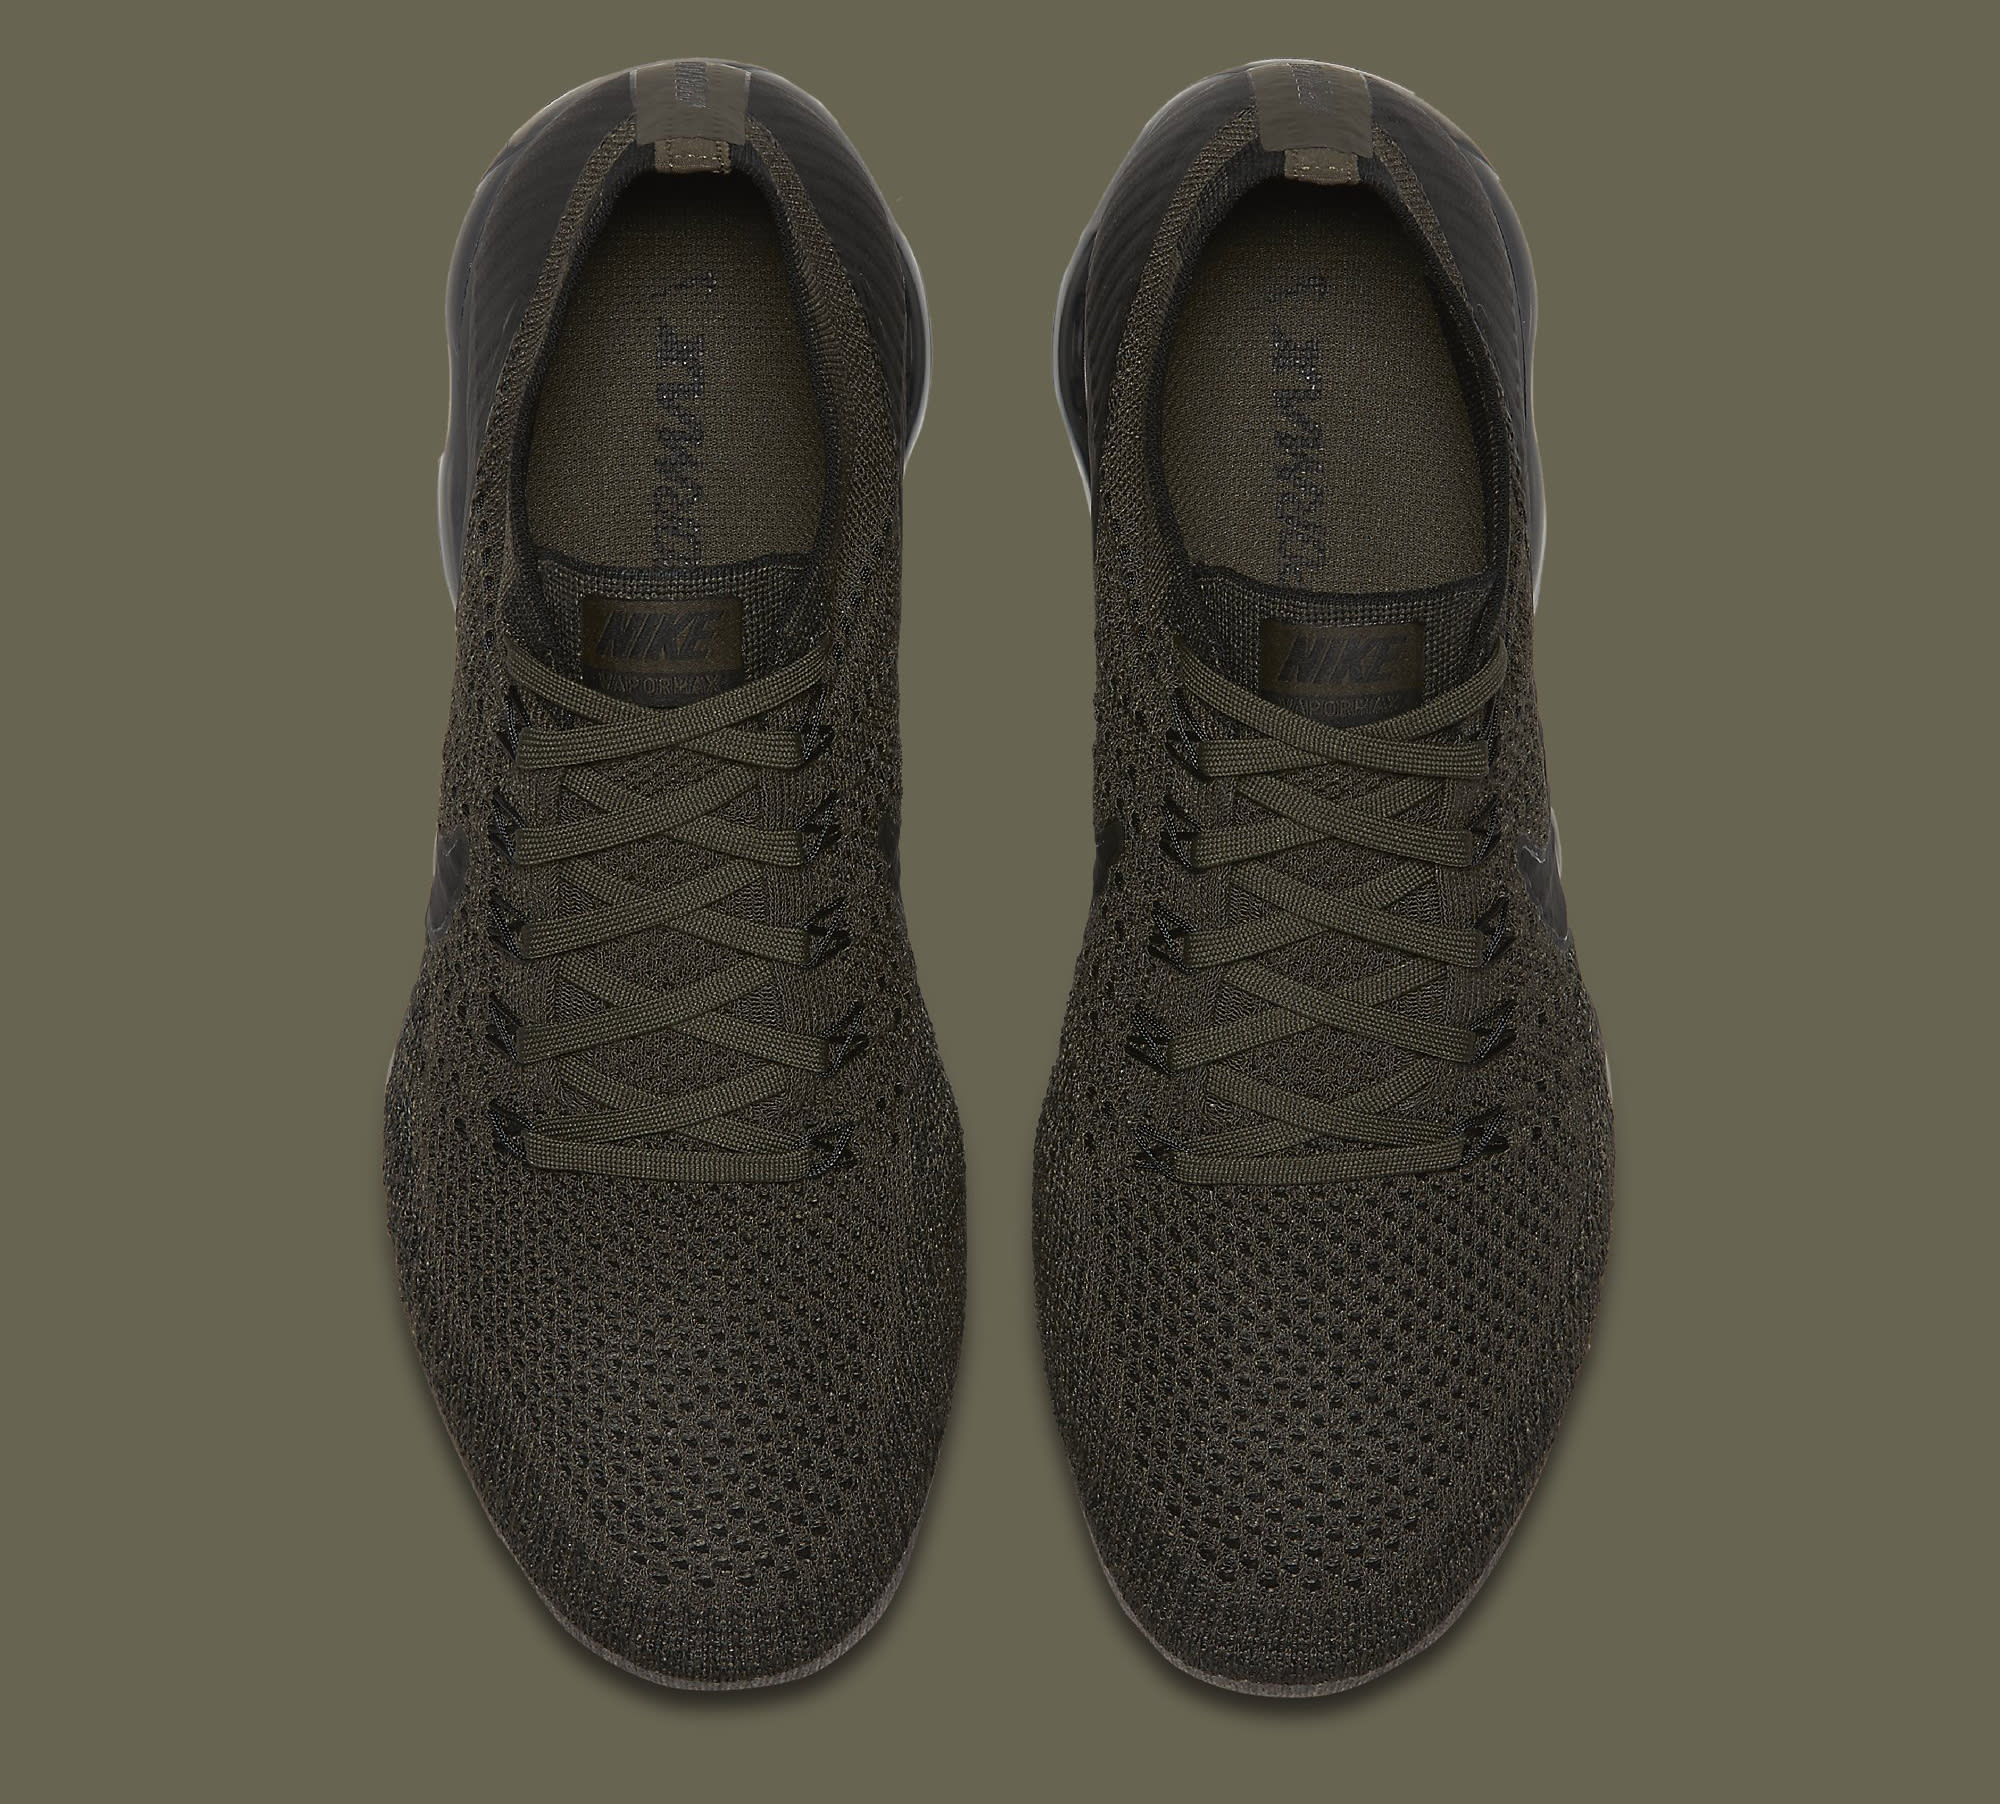 Cargo Khaki Nike VaporMax 849558-300 Top